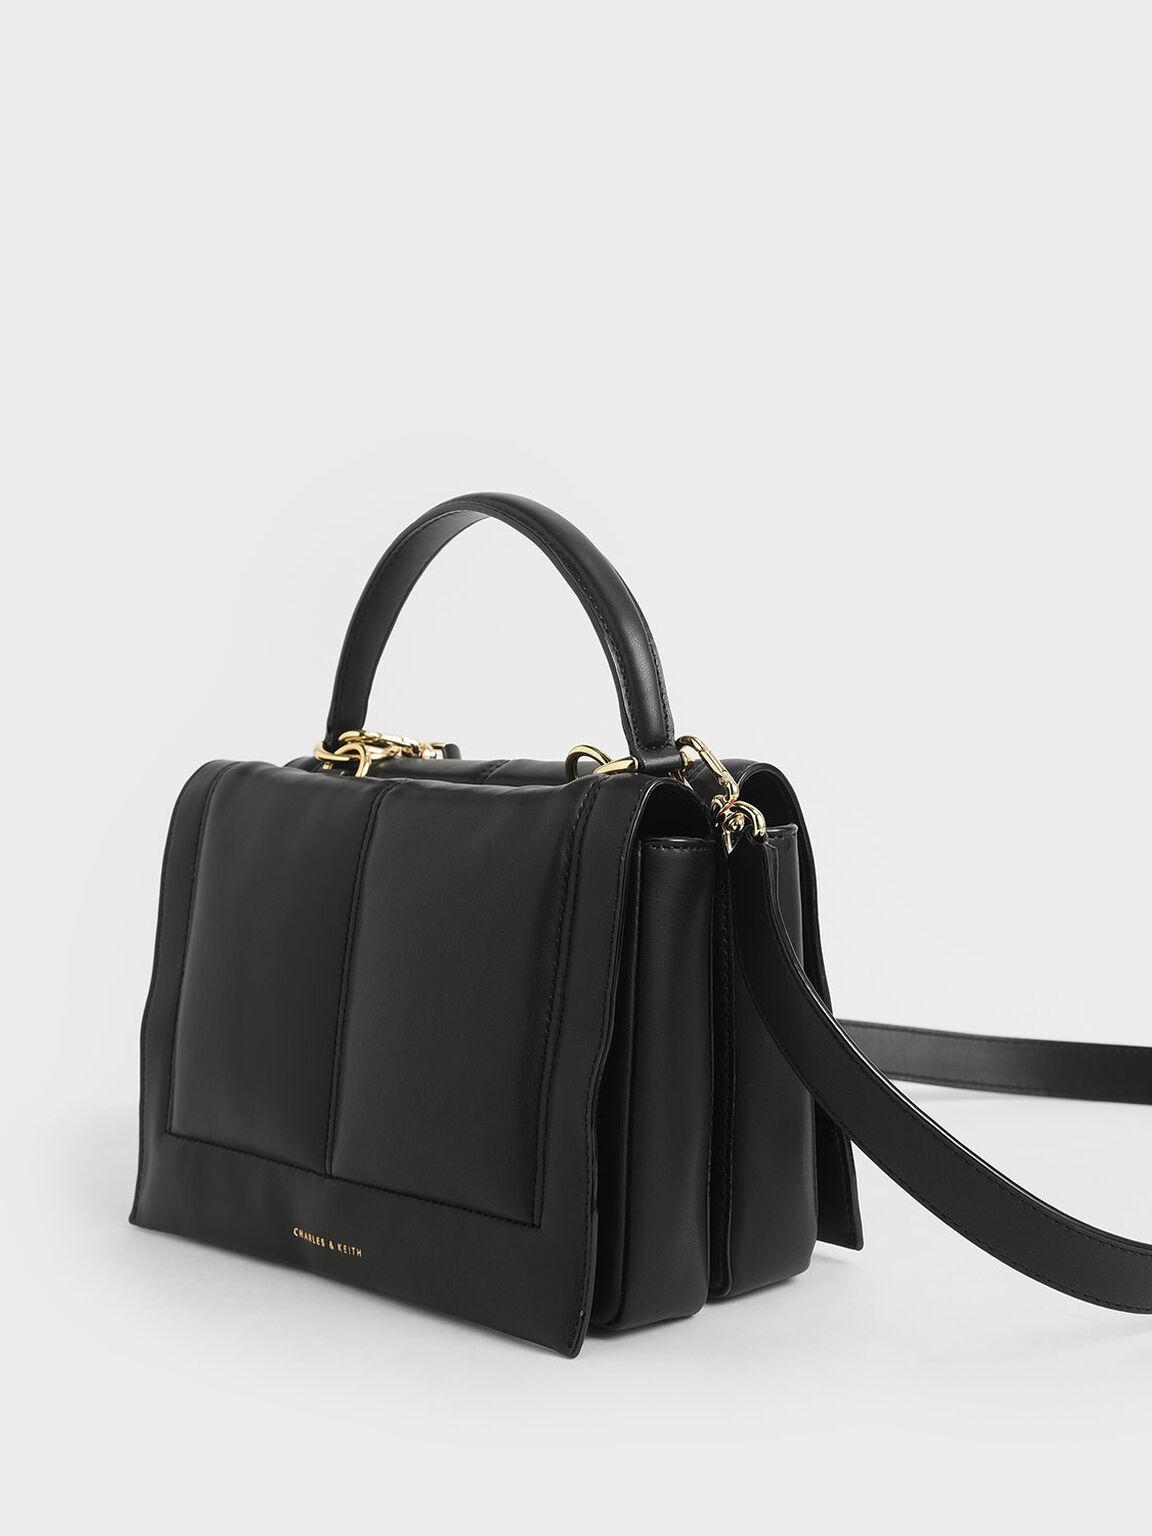 Quilted Top Handle Bag, Black, hi-res